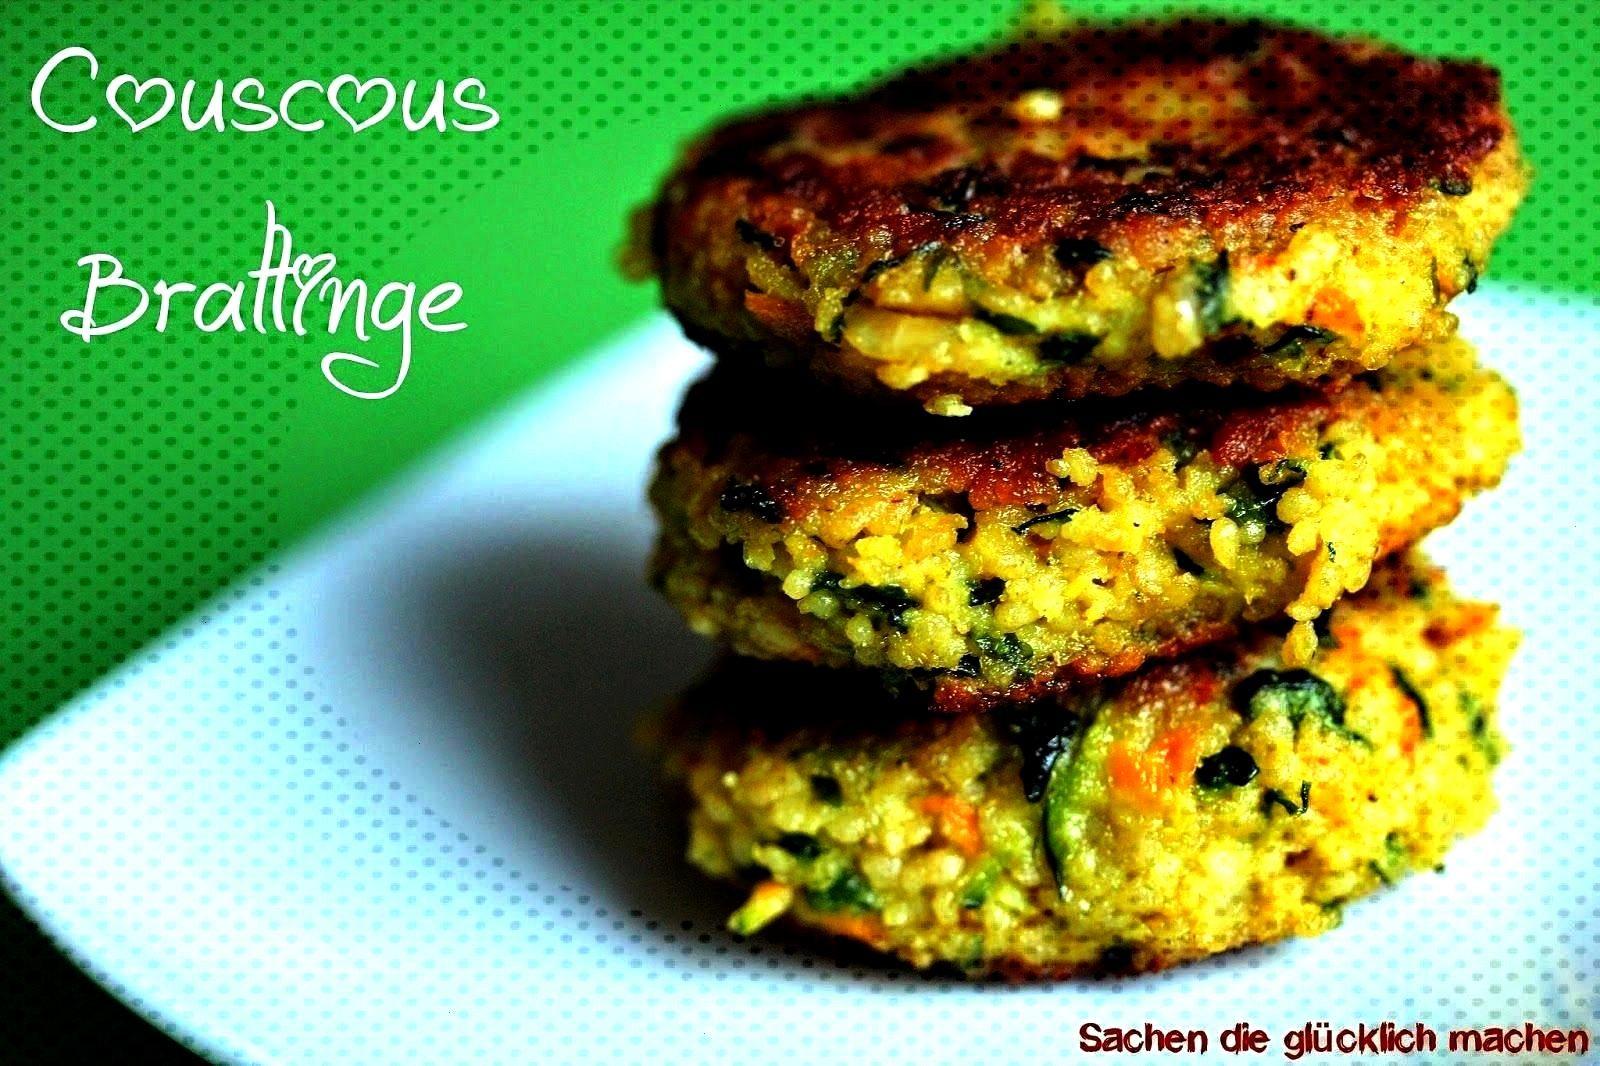 make you happy: couscous patties (VEGAN possible) -  Things that make you happy: couscous patties (